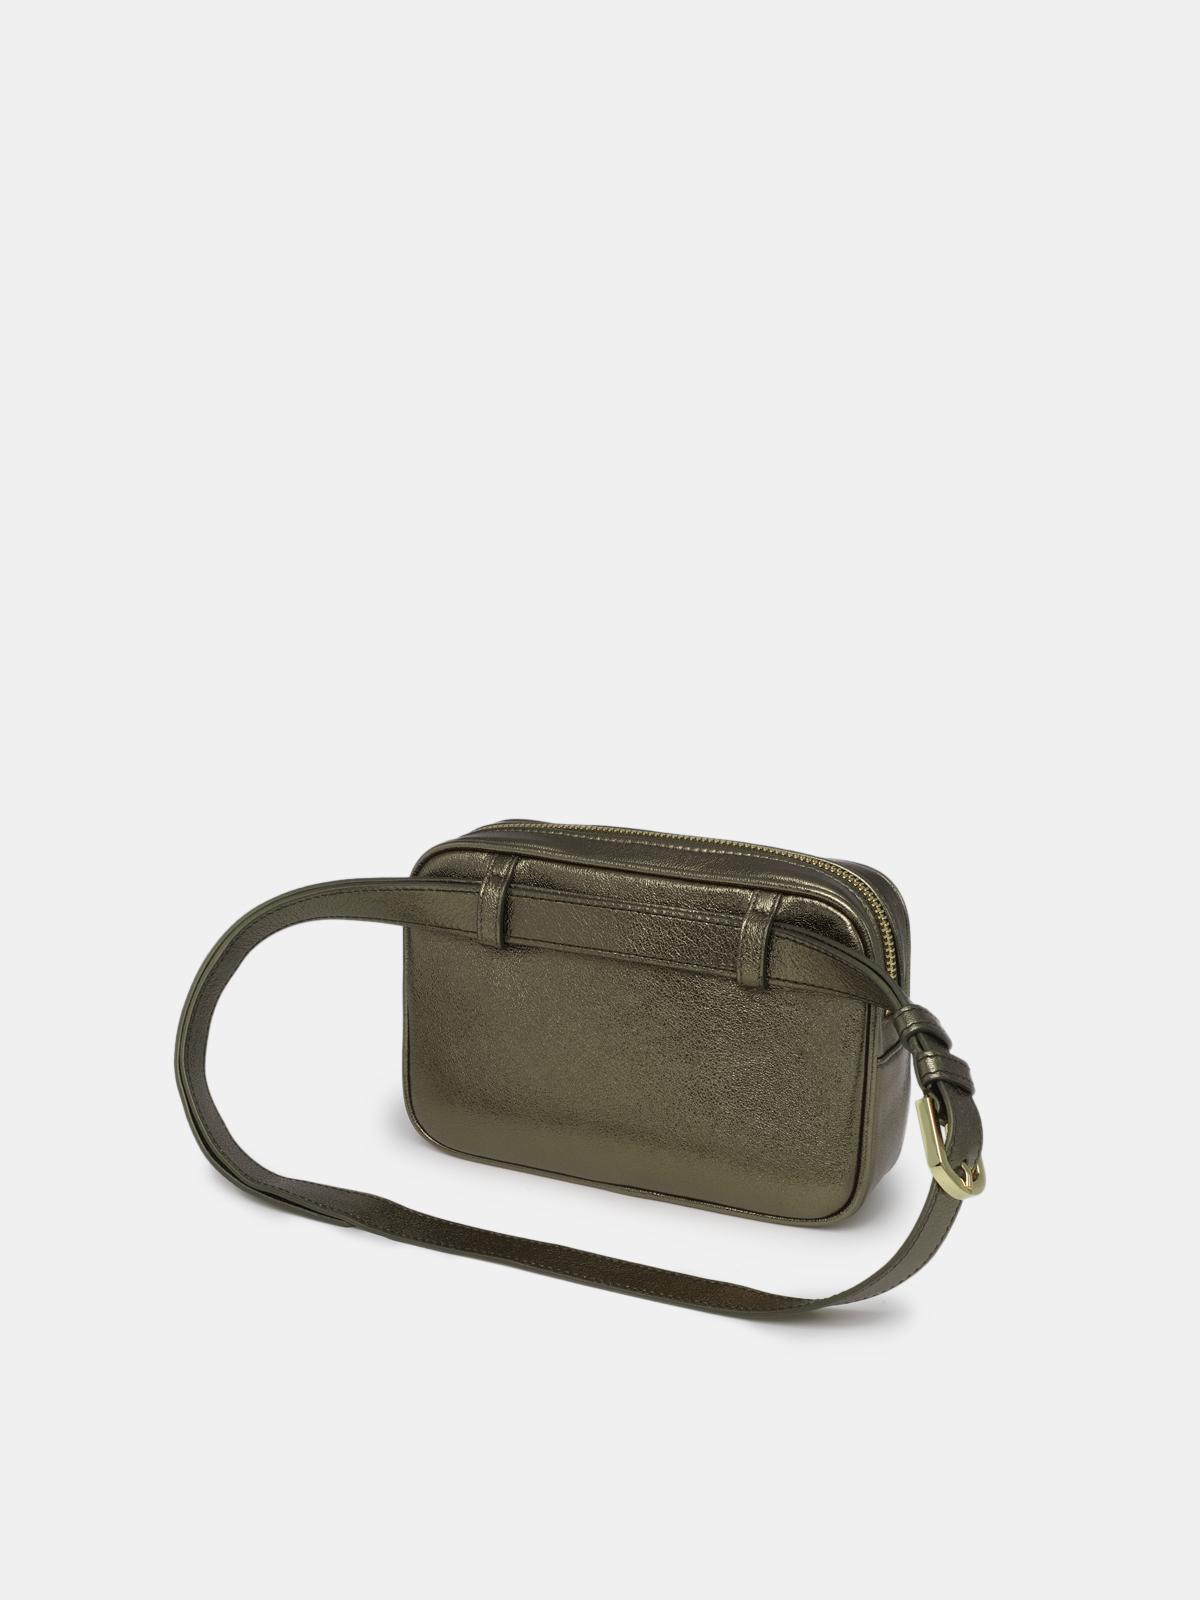 Golden Goose - Star Belt Bag made of green laminated leather in